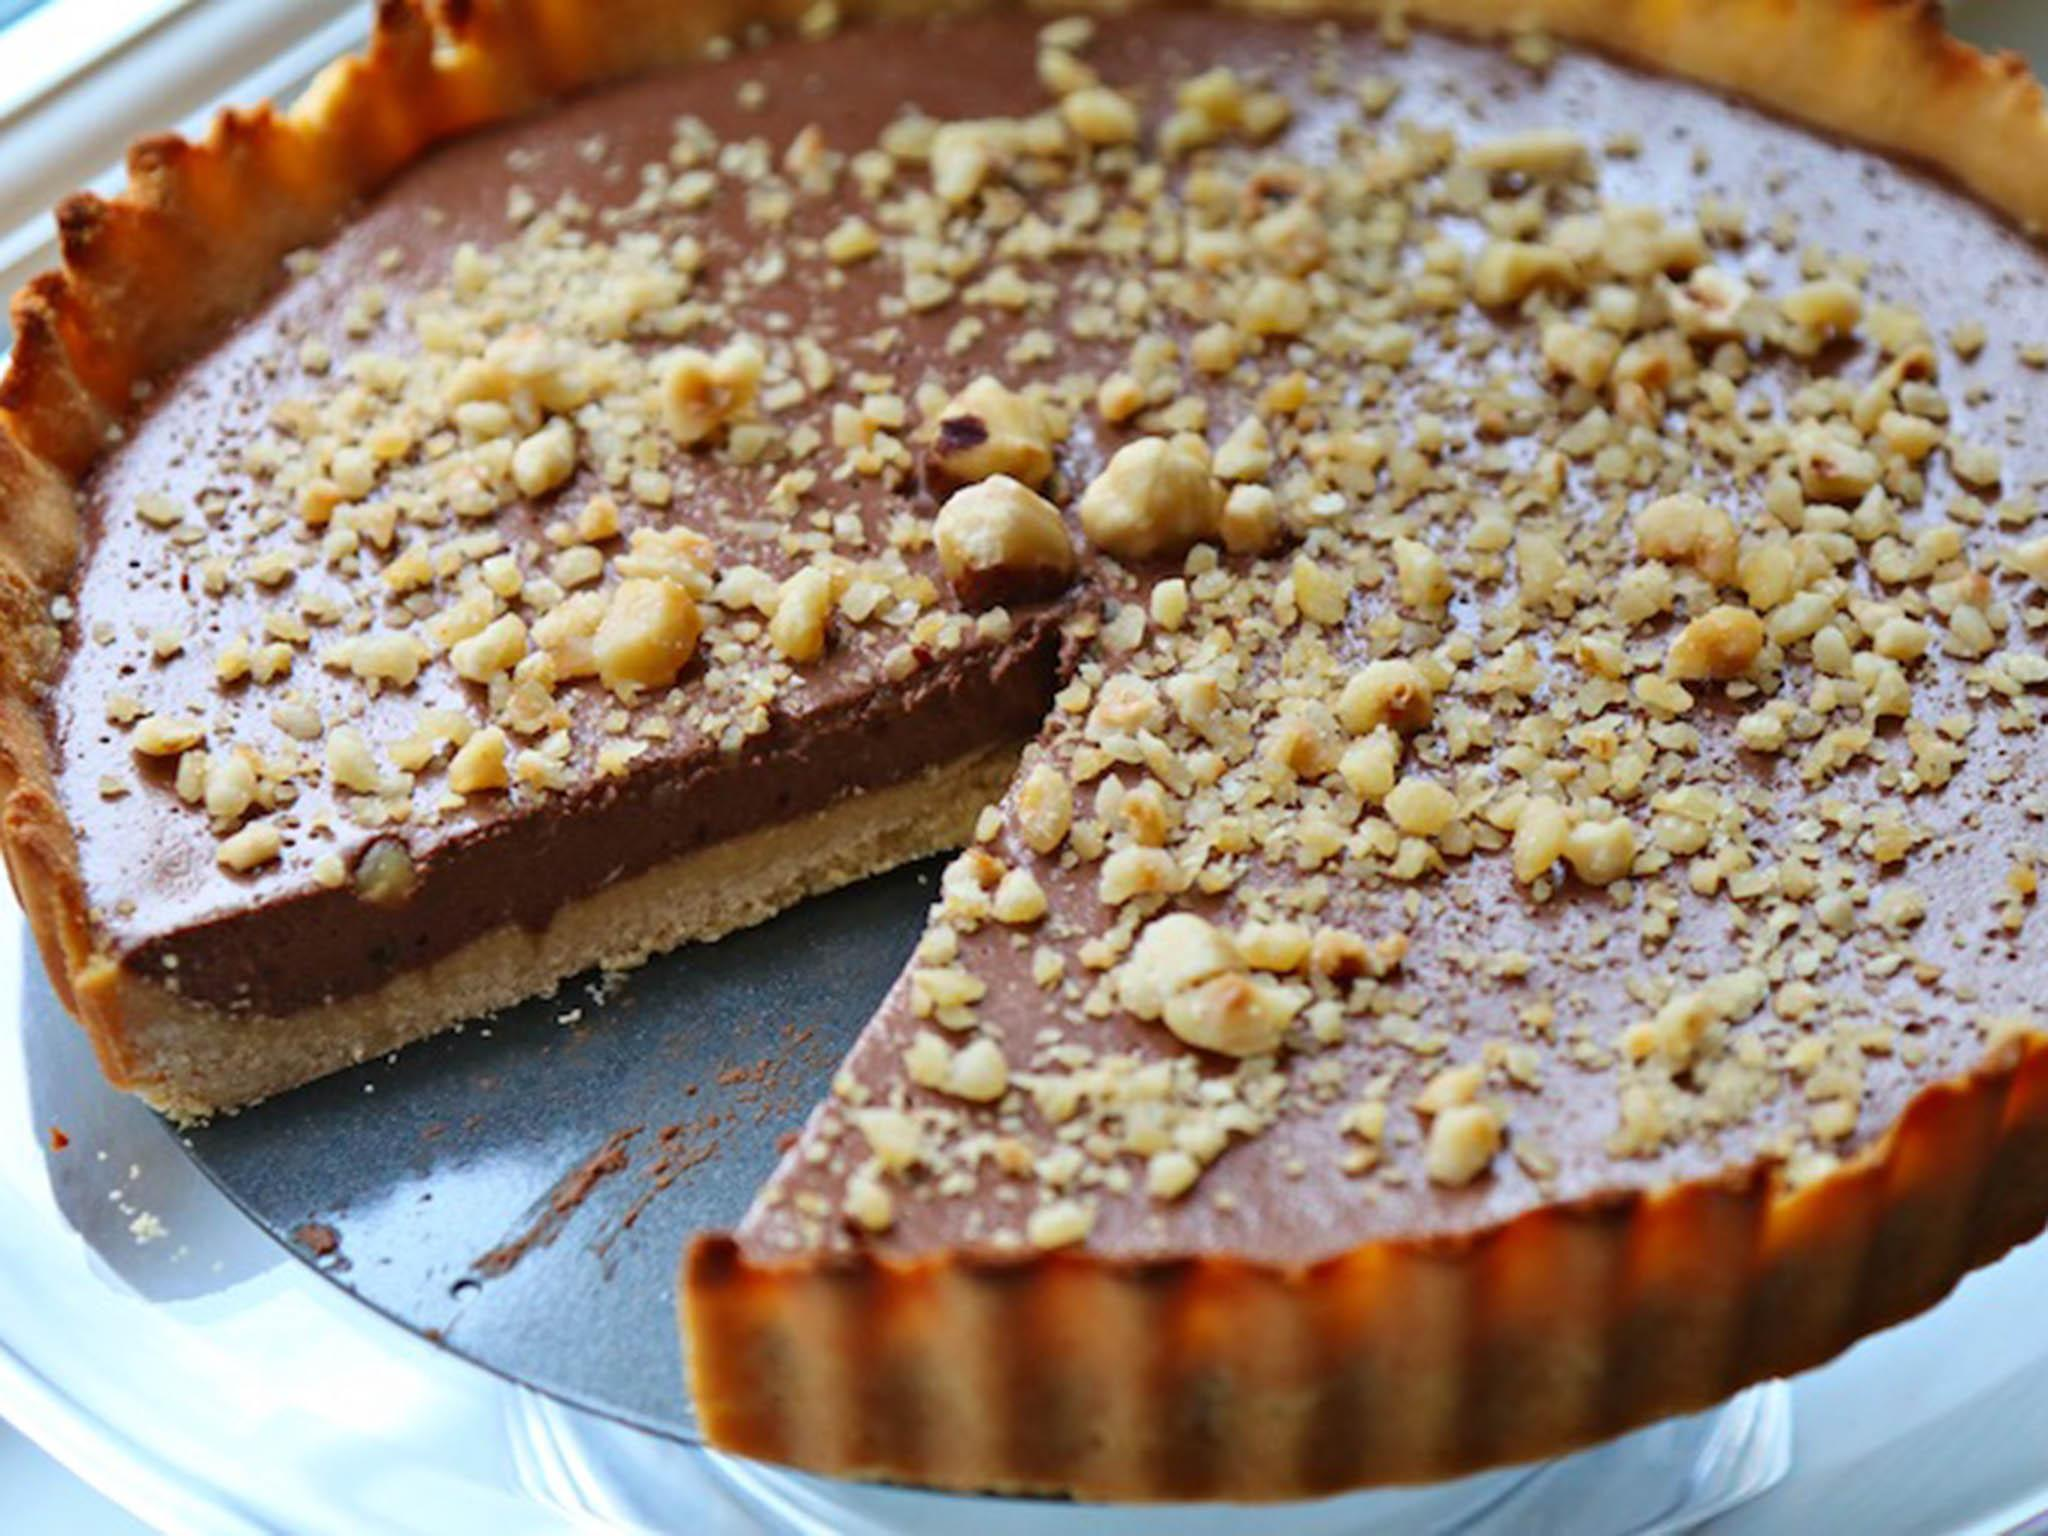 Fairtrade Fortnight 2018: From cacao and hazelnut tarts to raspberry lucuma possets